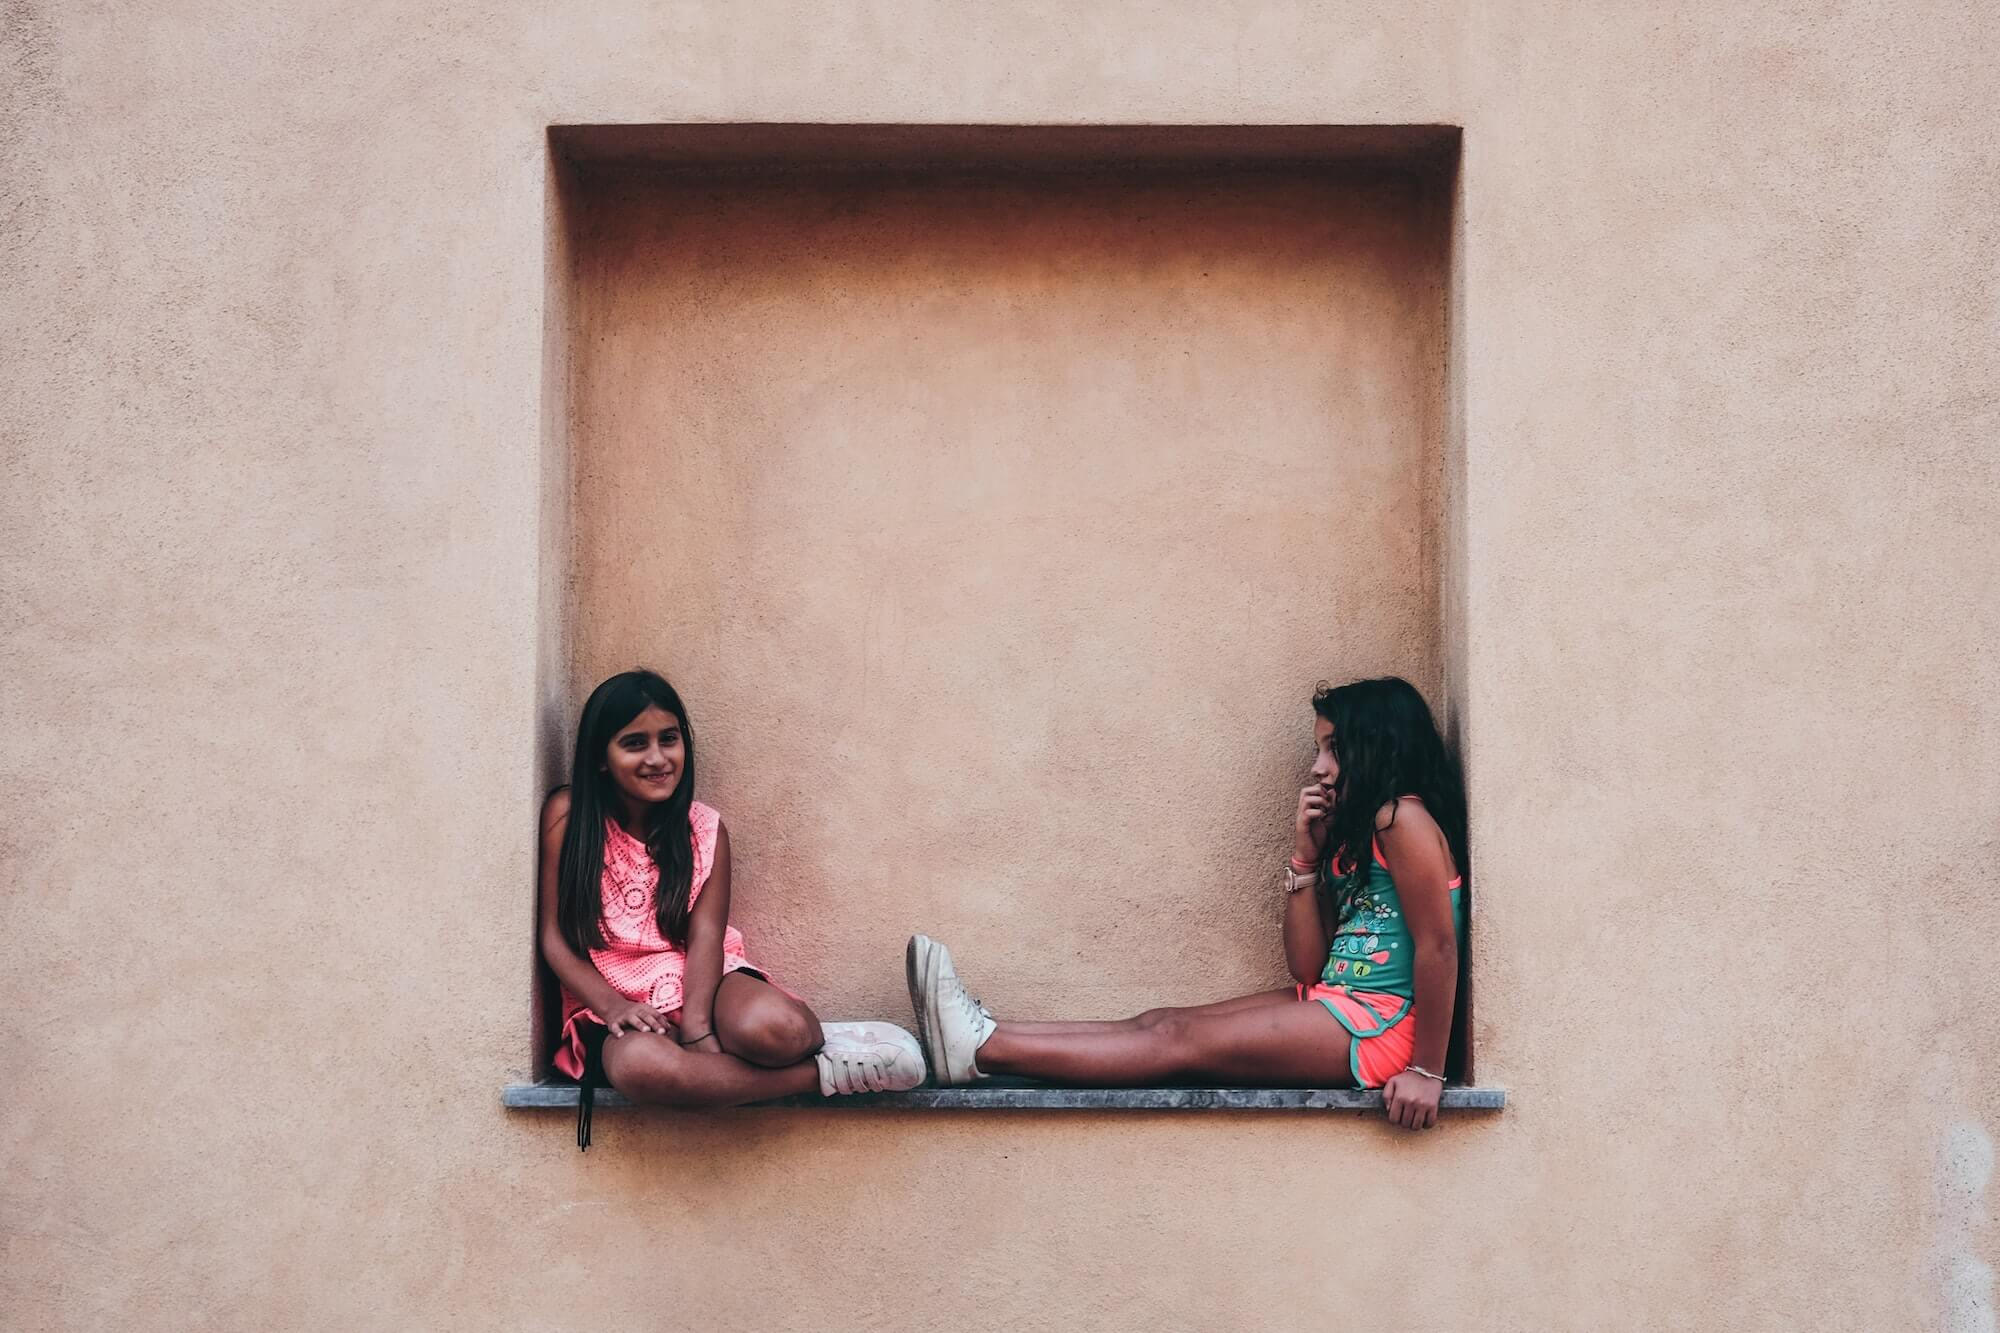 Scenery photograph, people photography, kids playing photo